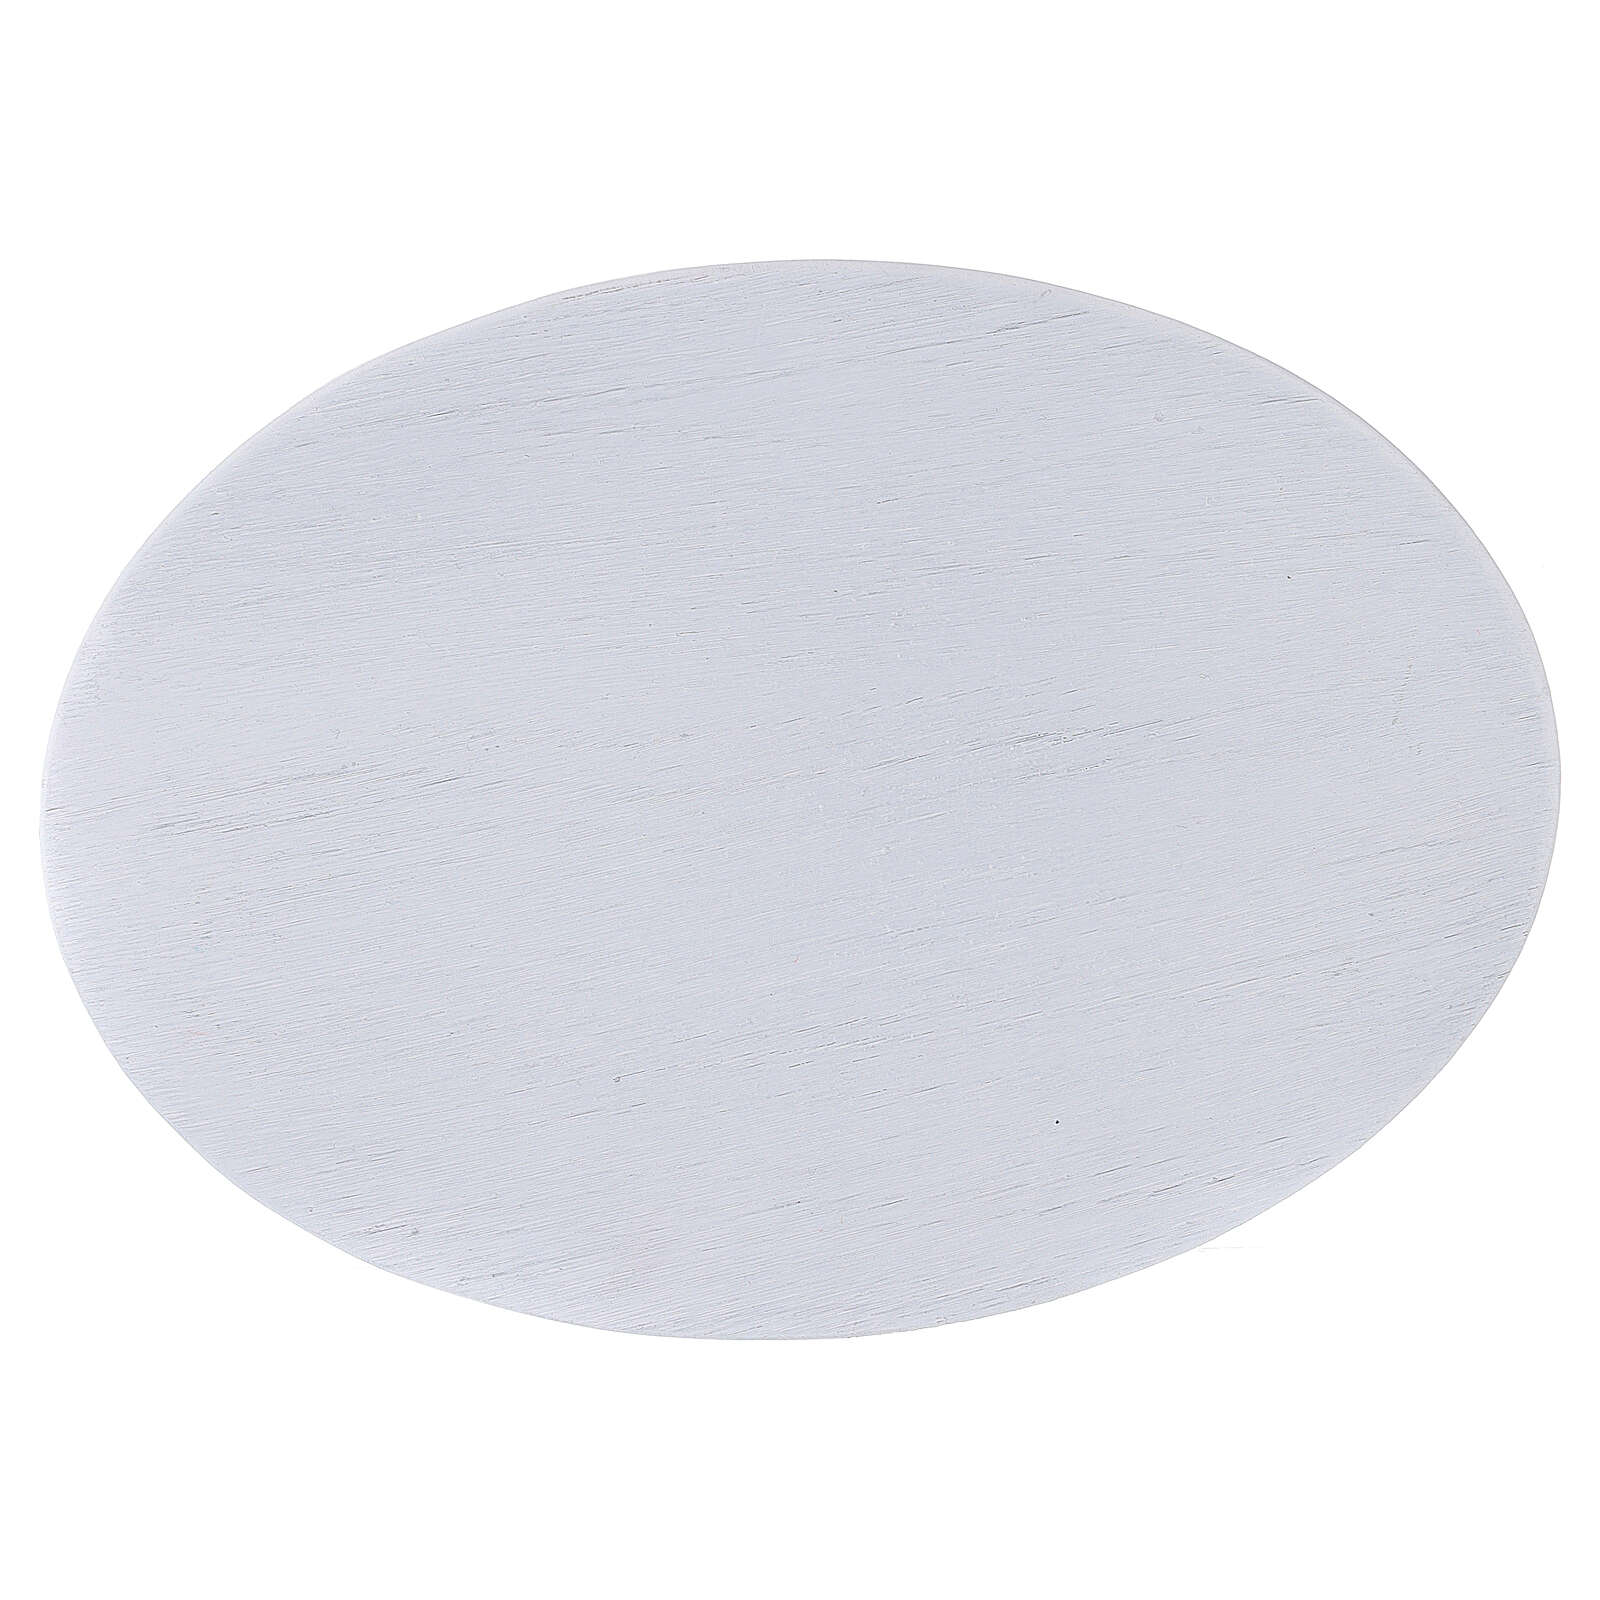 Assiette bougeoir aluminium blanc brossé 17x12 cm 3